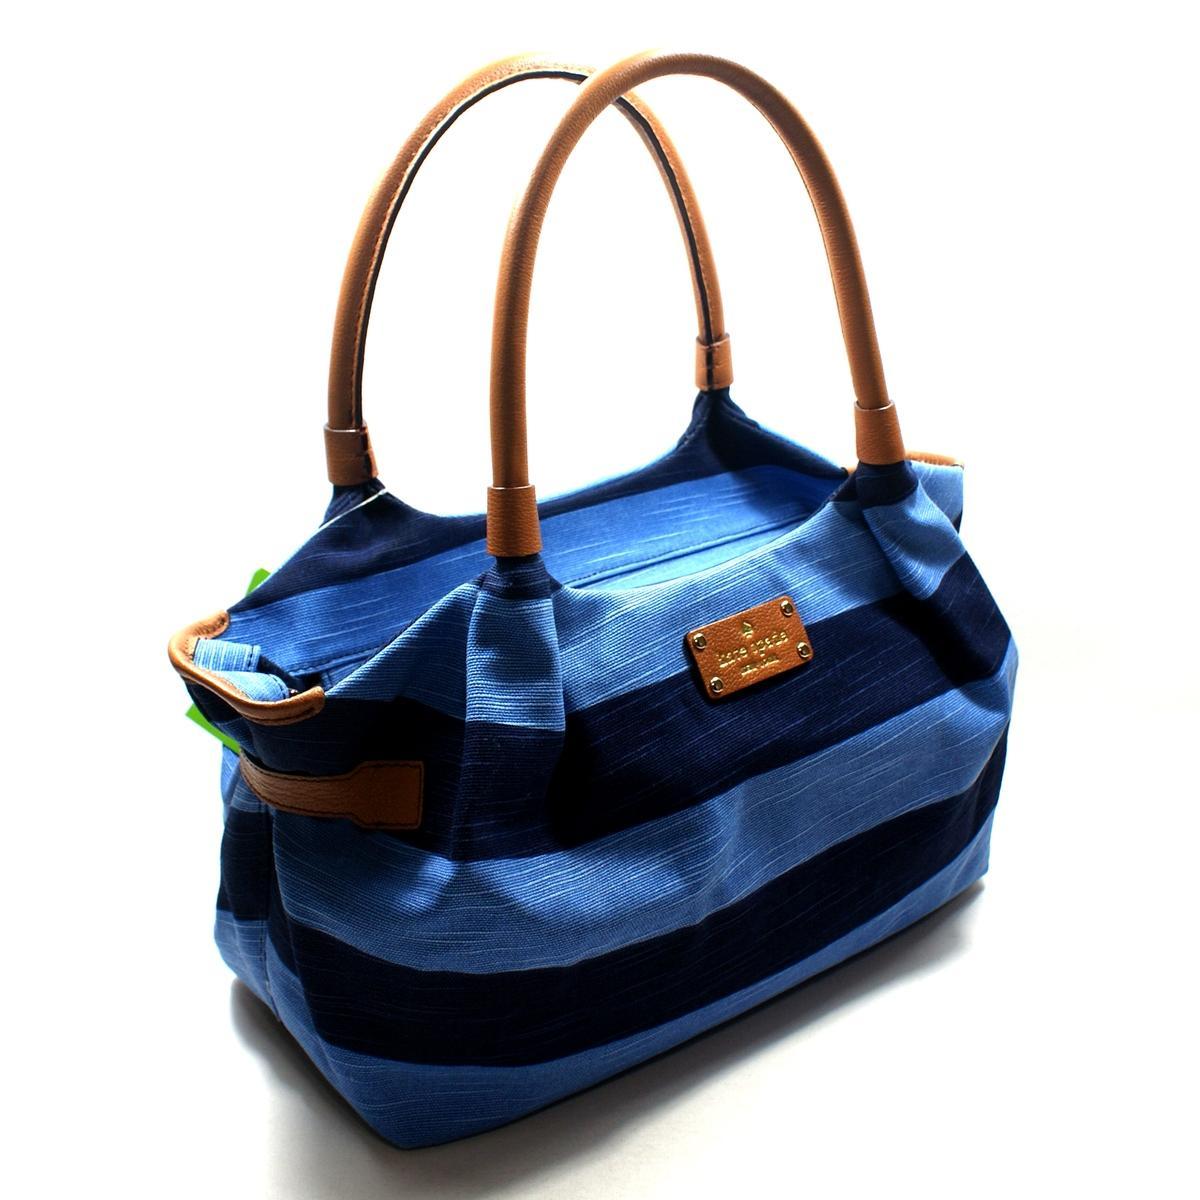 kate spade purse striped blue eBay